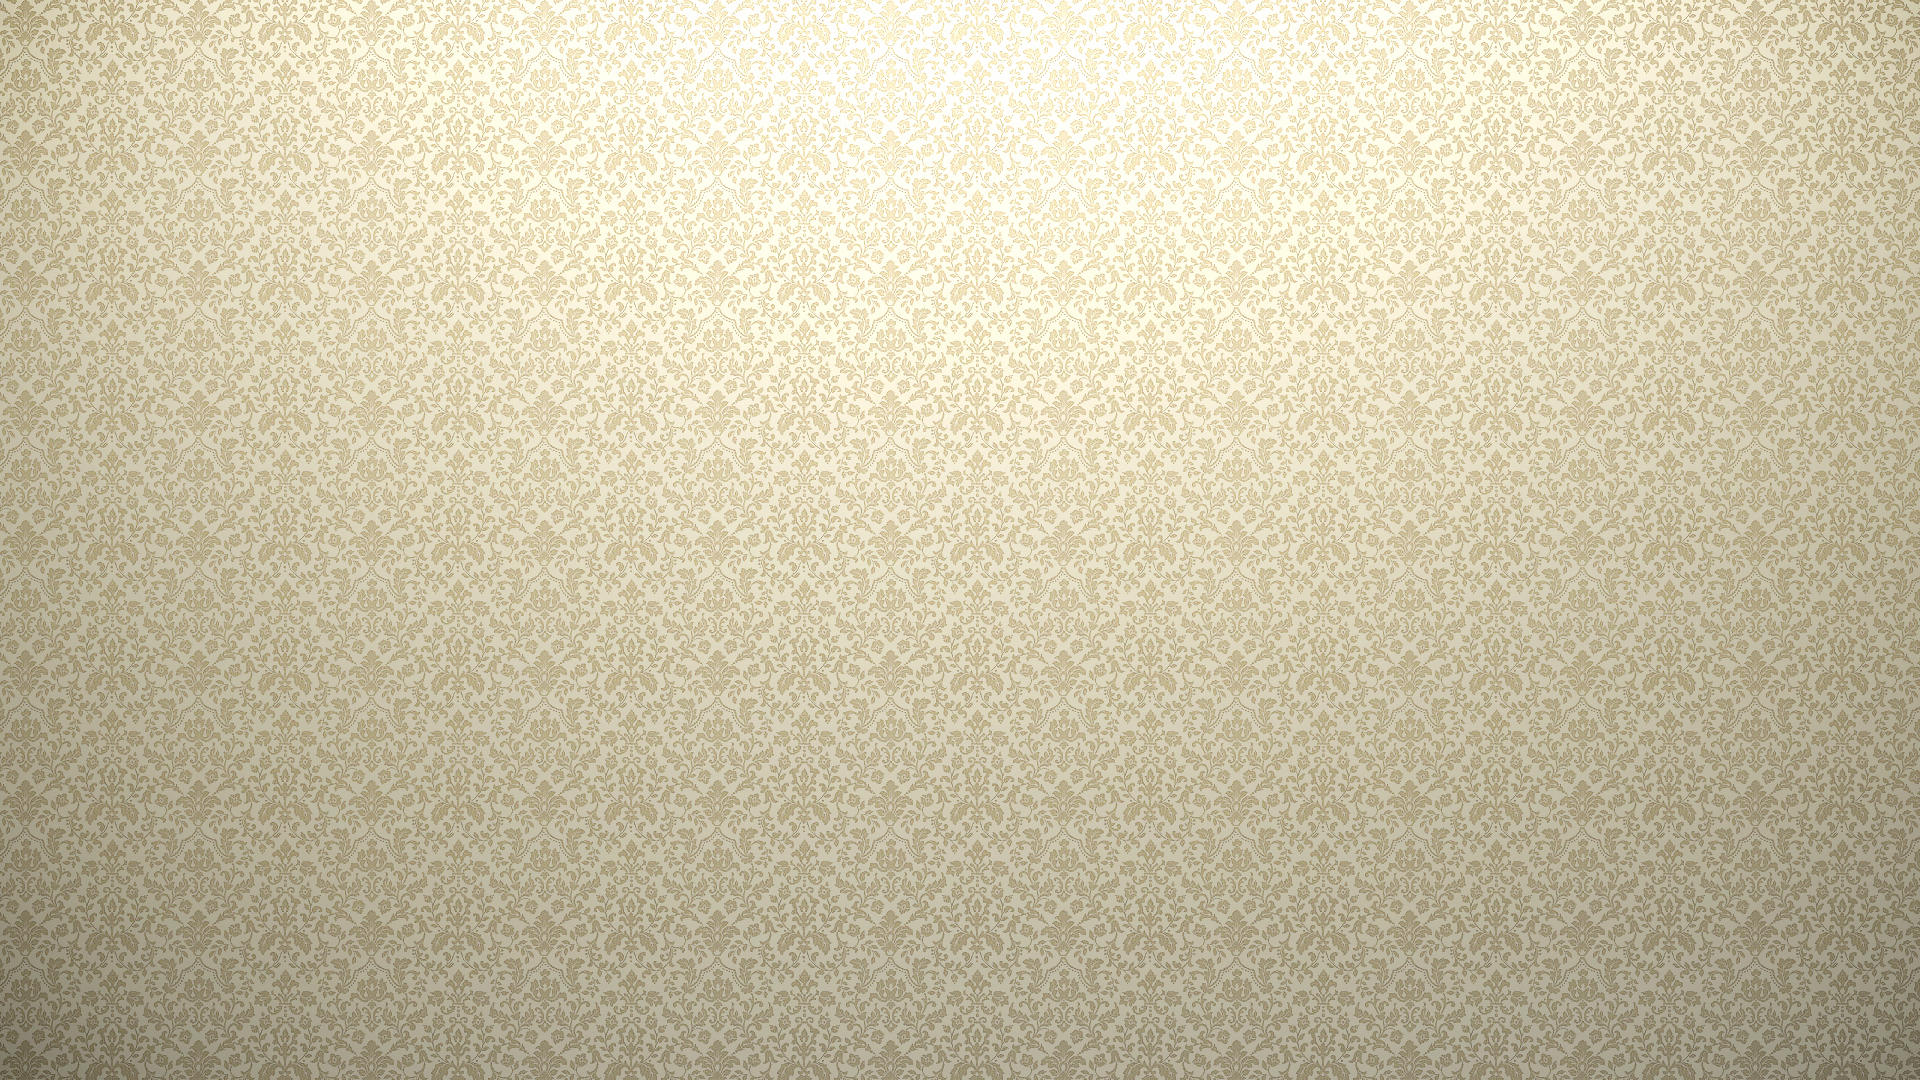 Pattern wallpaper 2017 grasscloth wallpaper for Wallpaper pattern